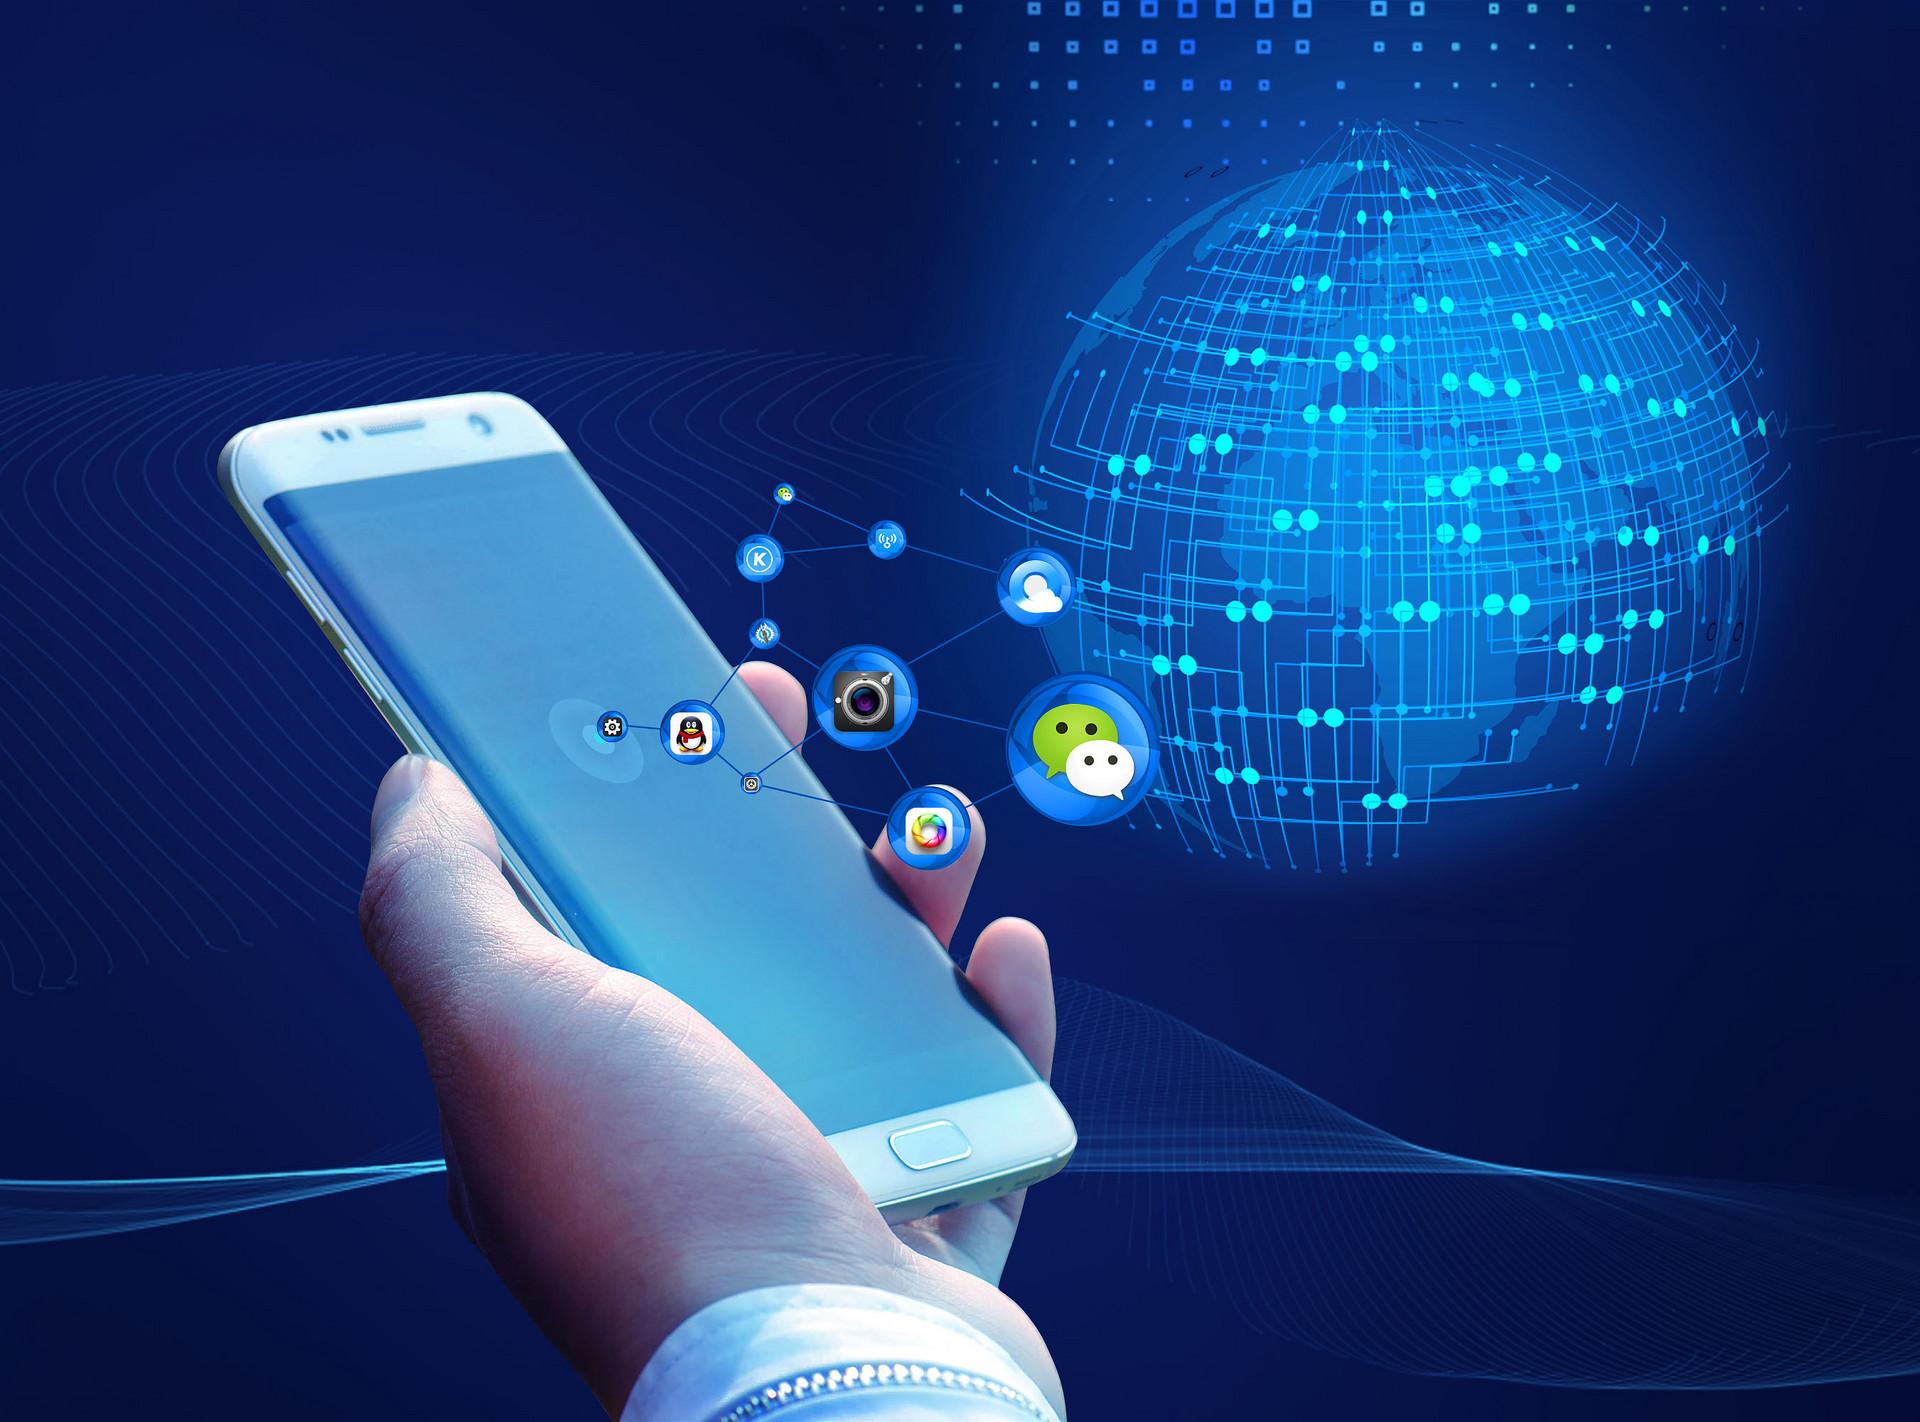 5G渐近 全球智能手机或将改变颓势